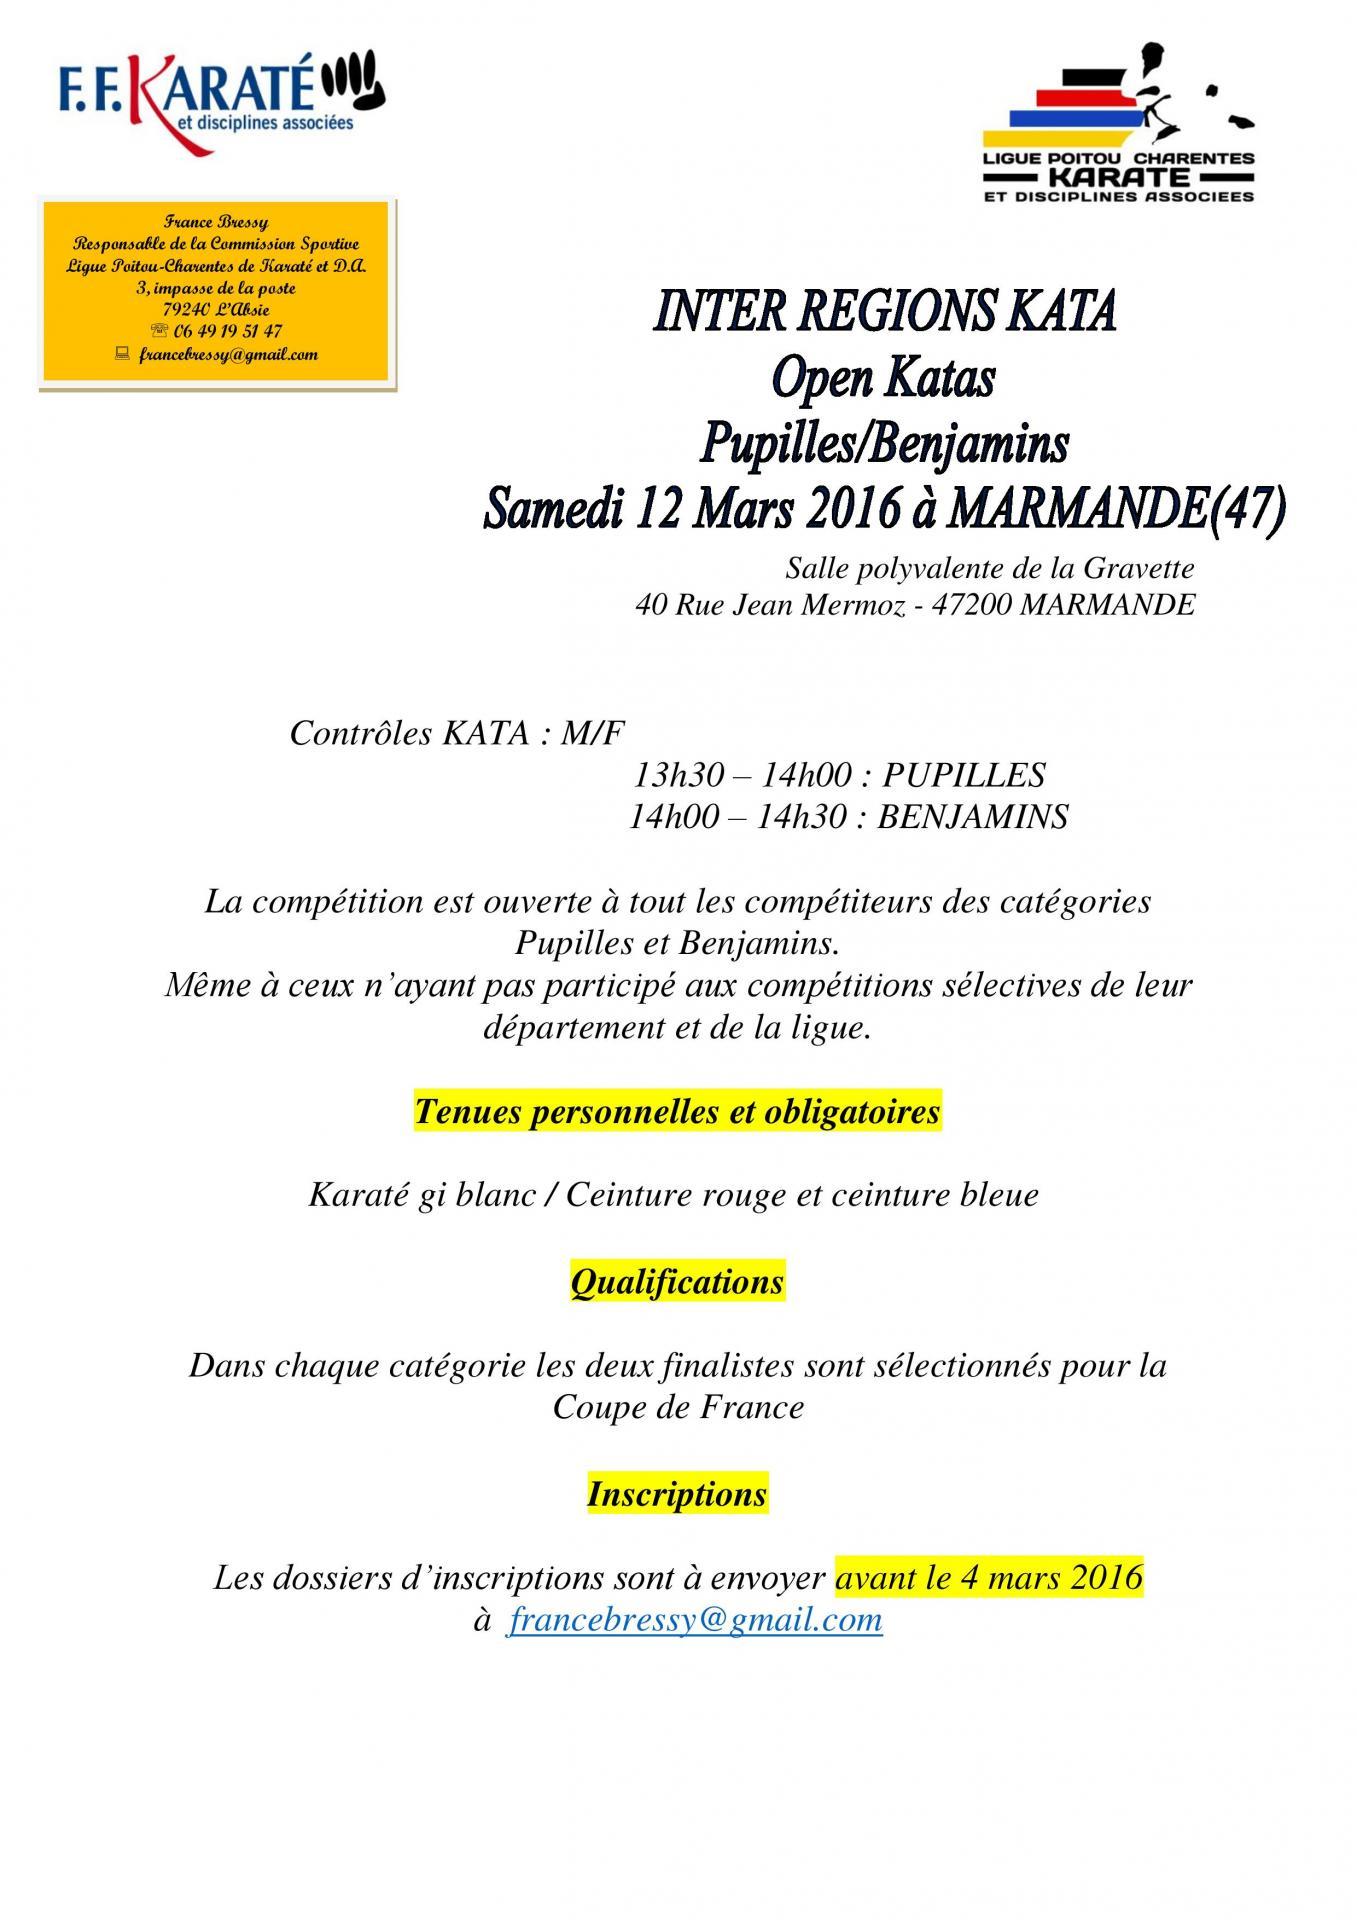 Inter regions katas